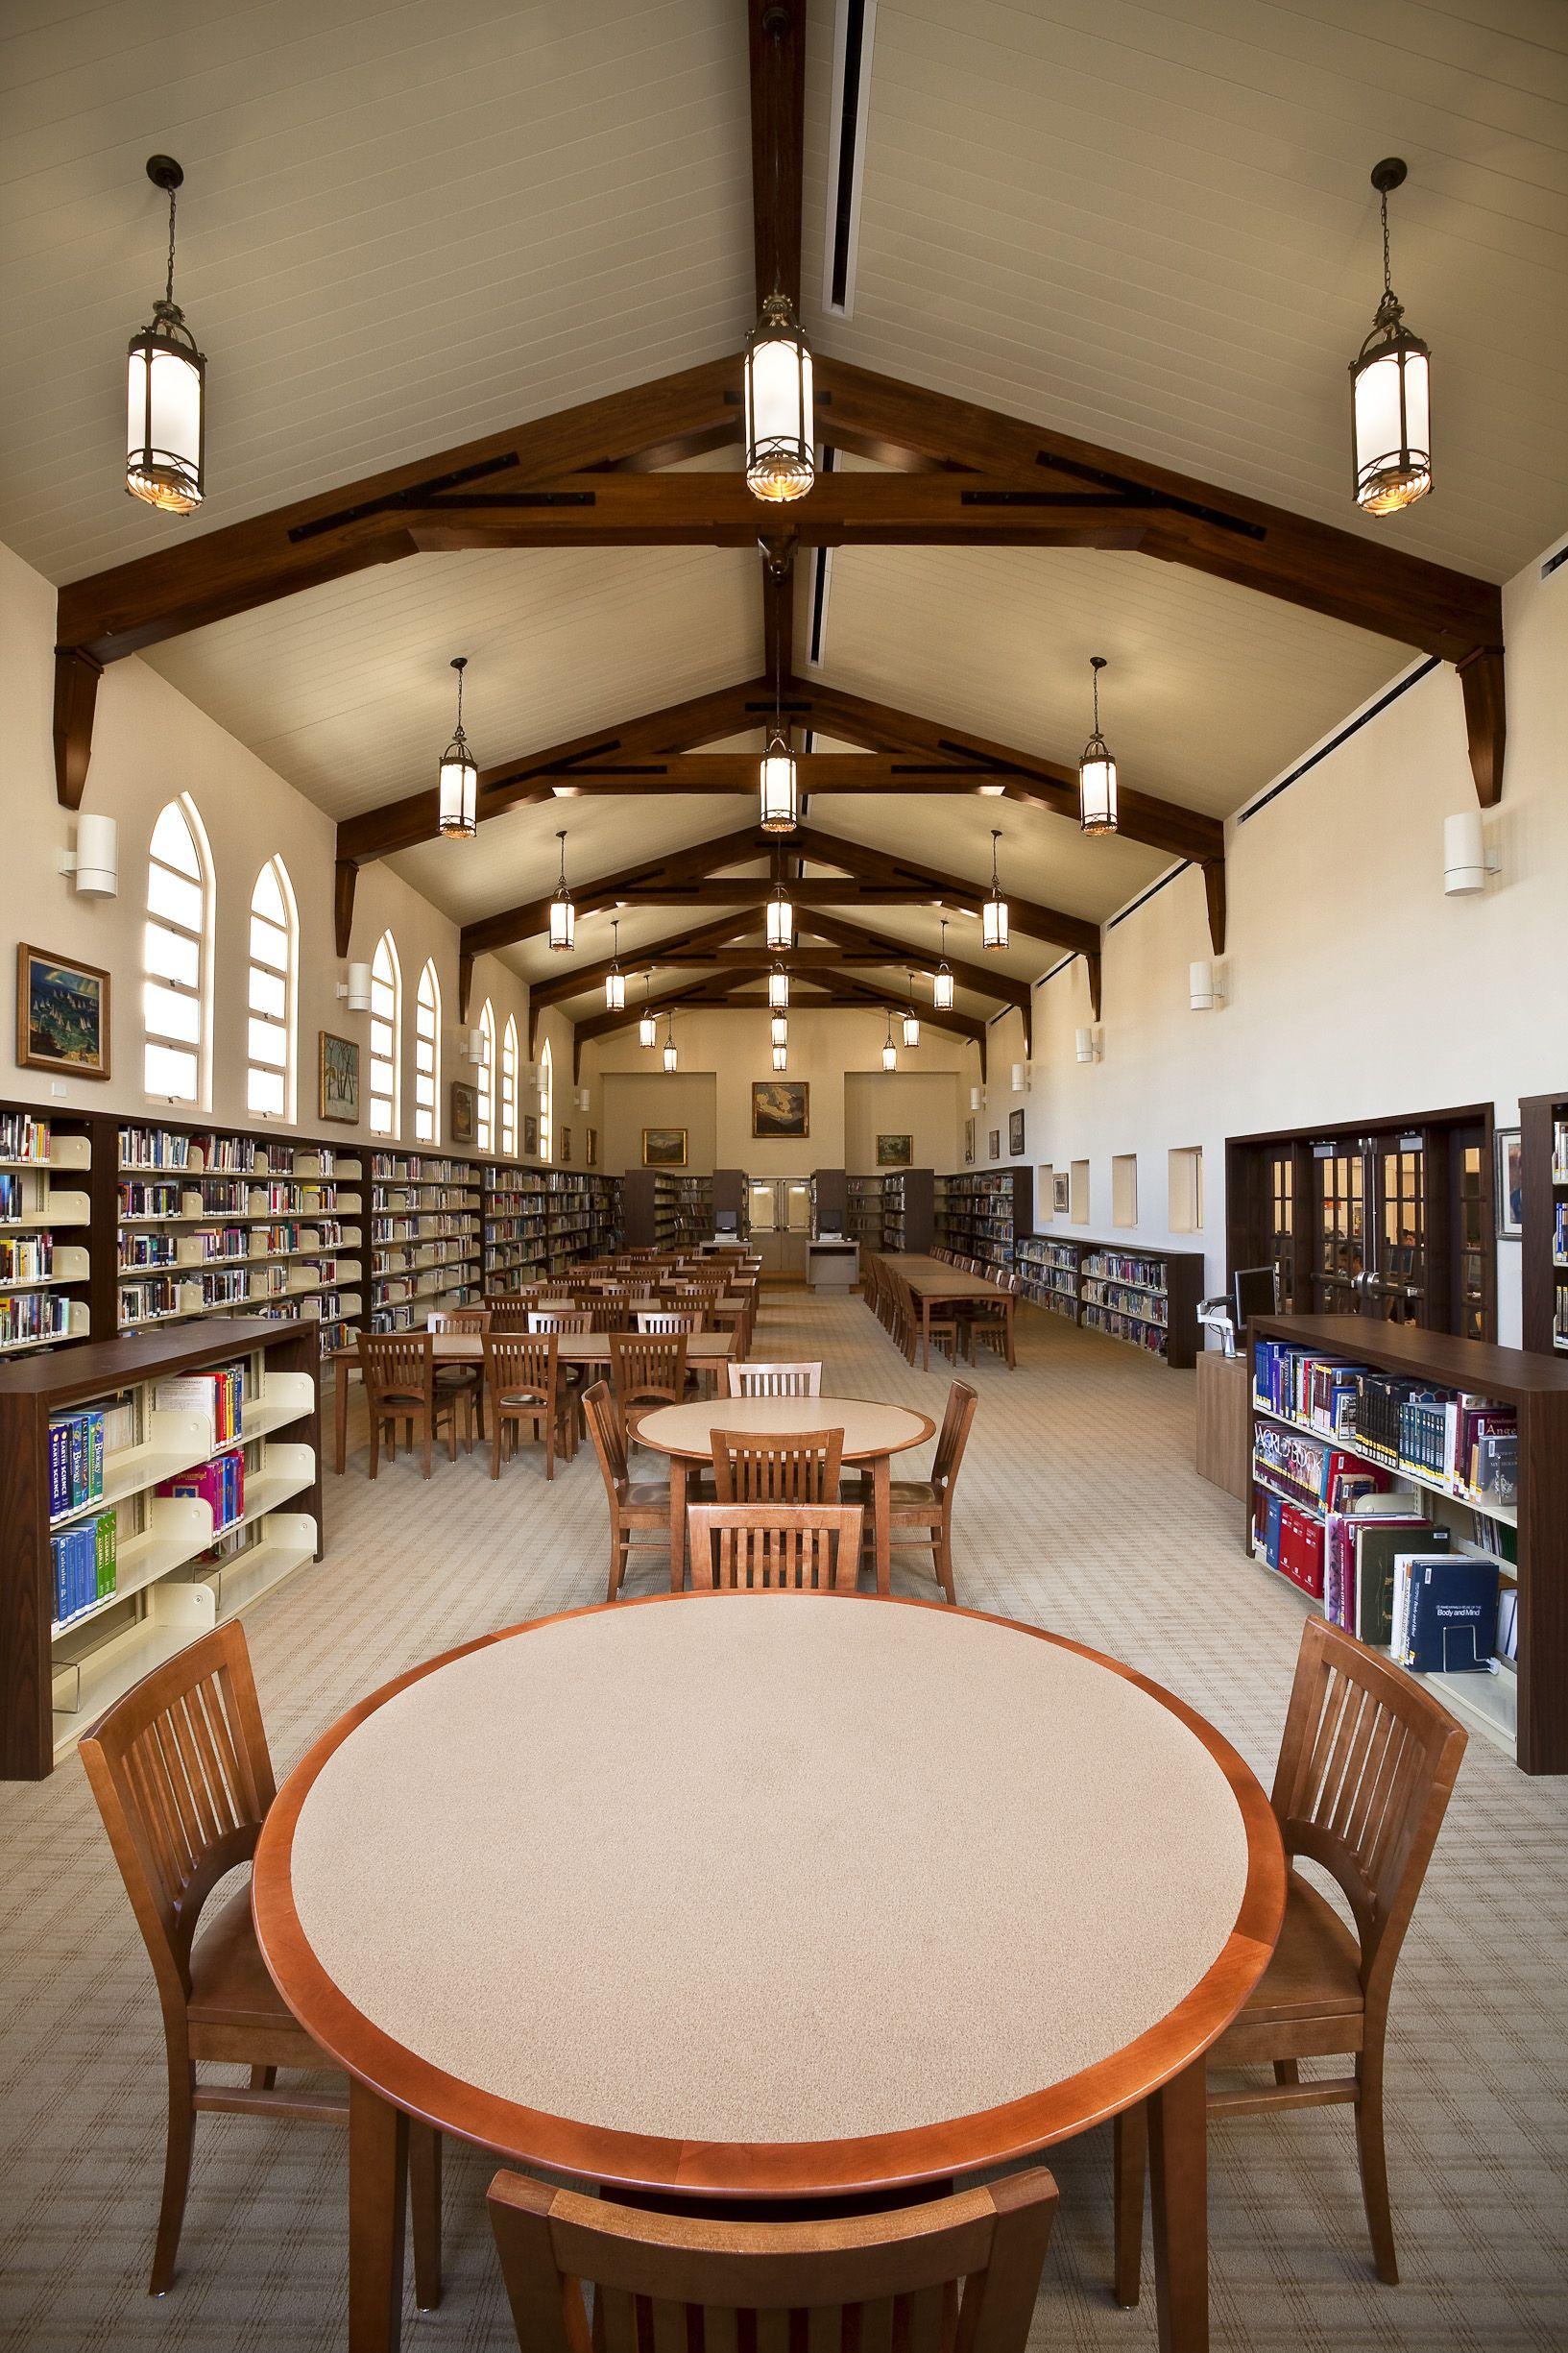 A Peek Inside The Library At Newport Harbor High School